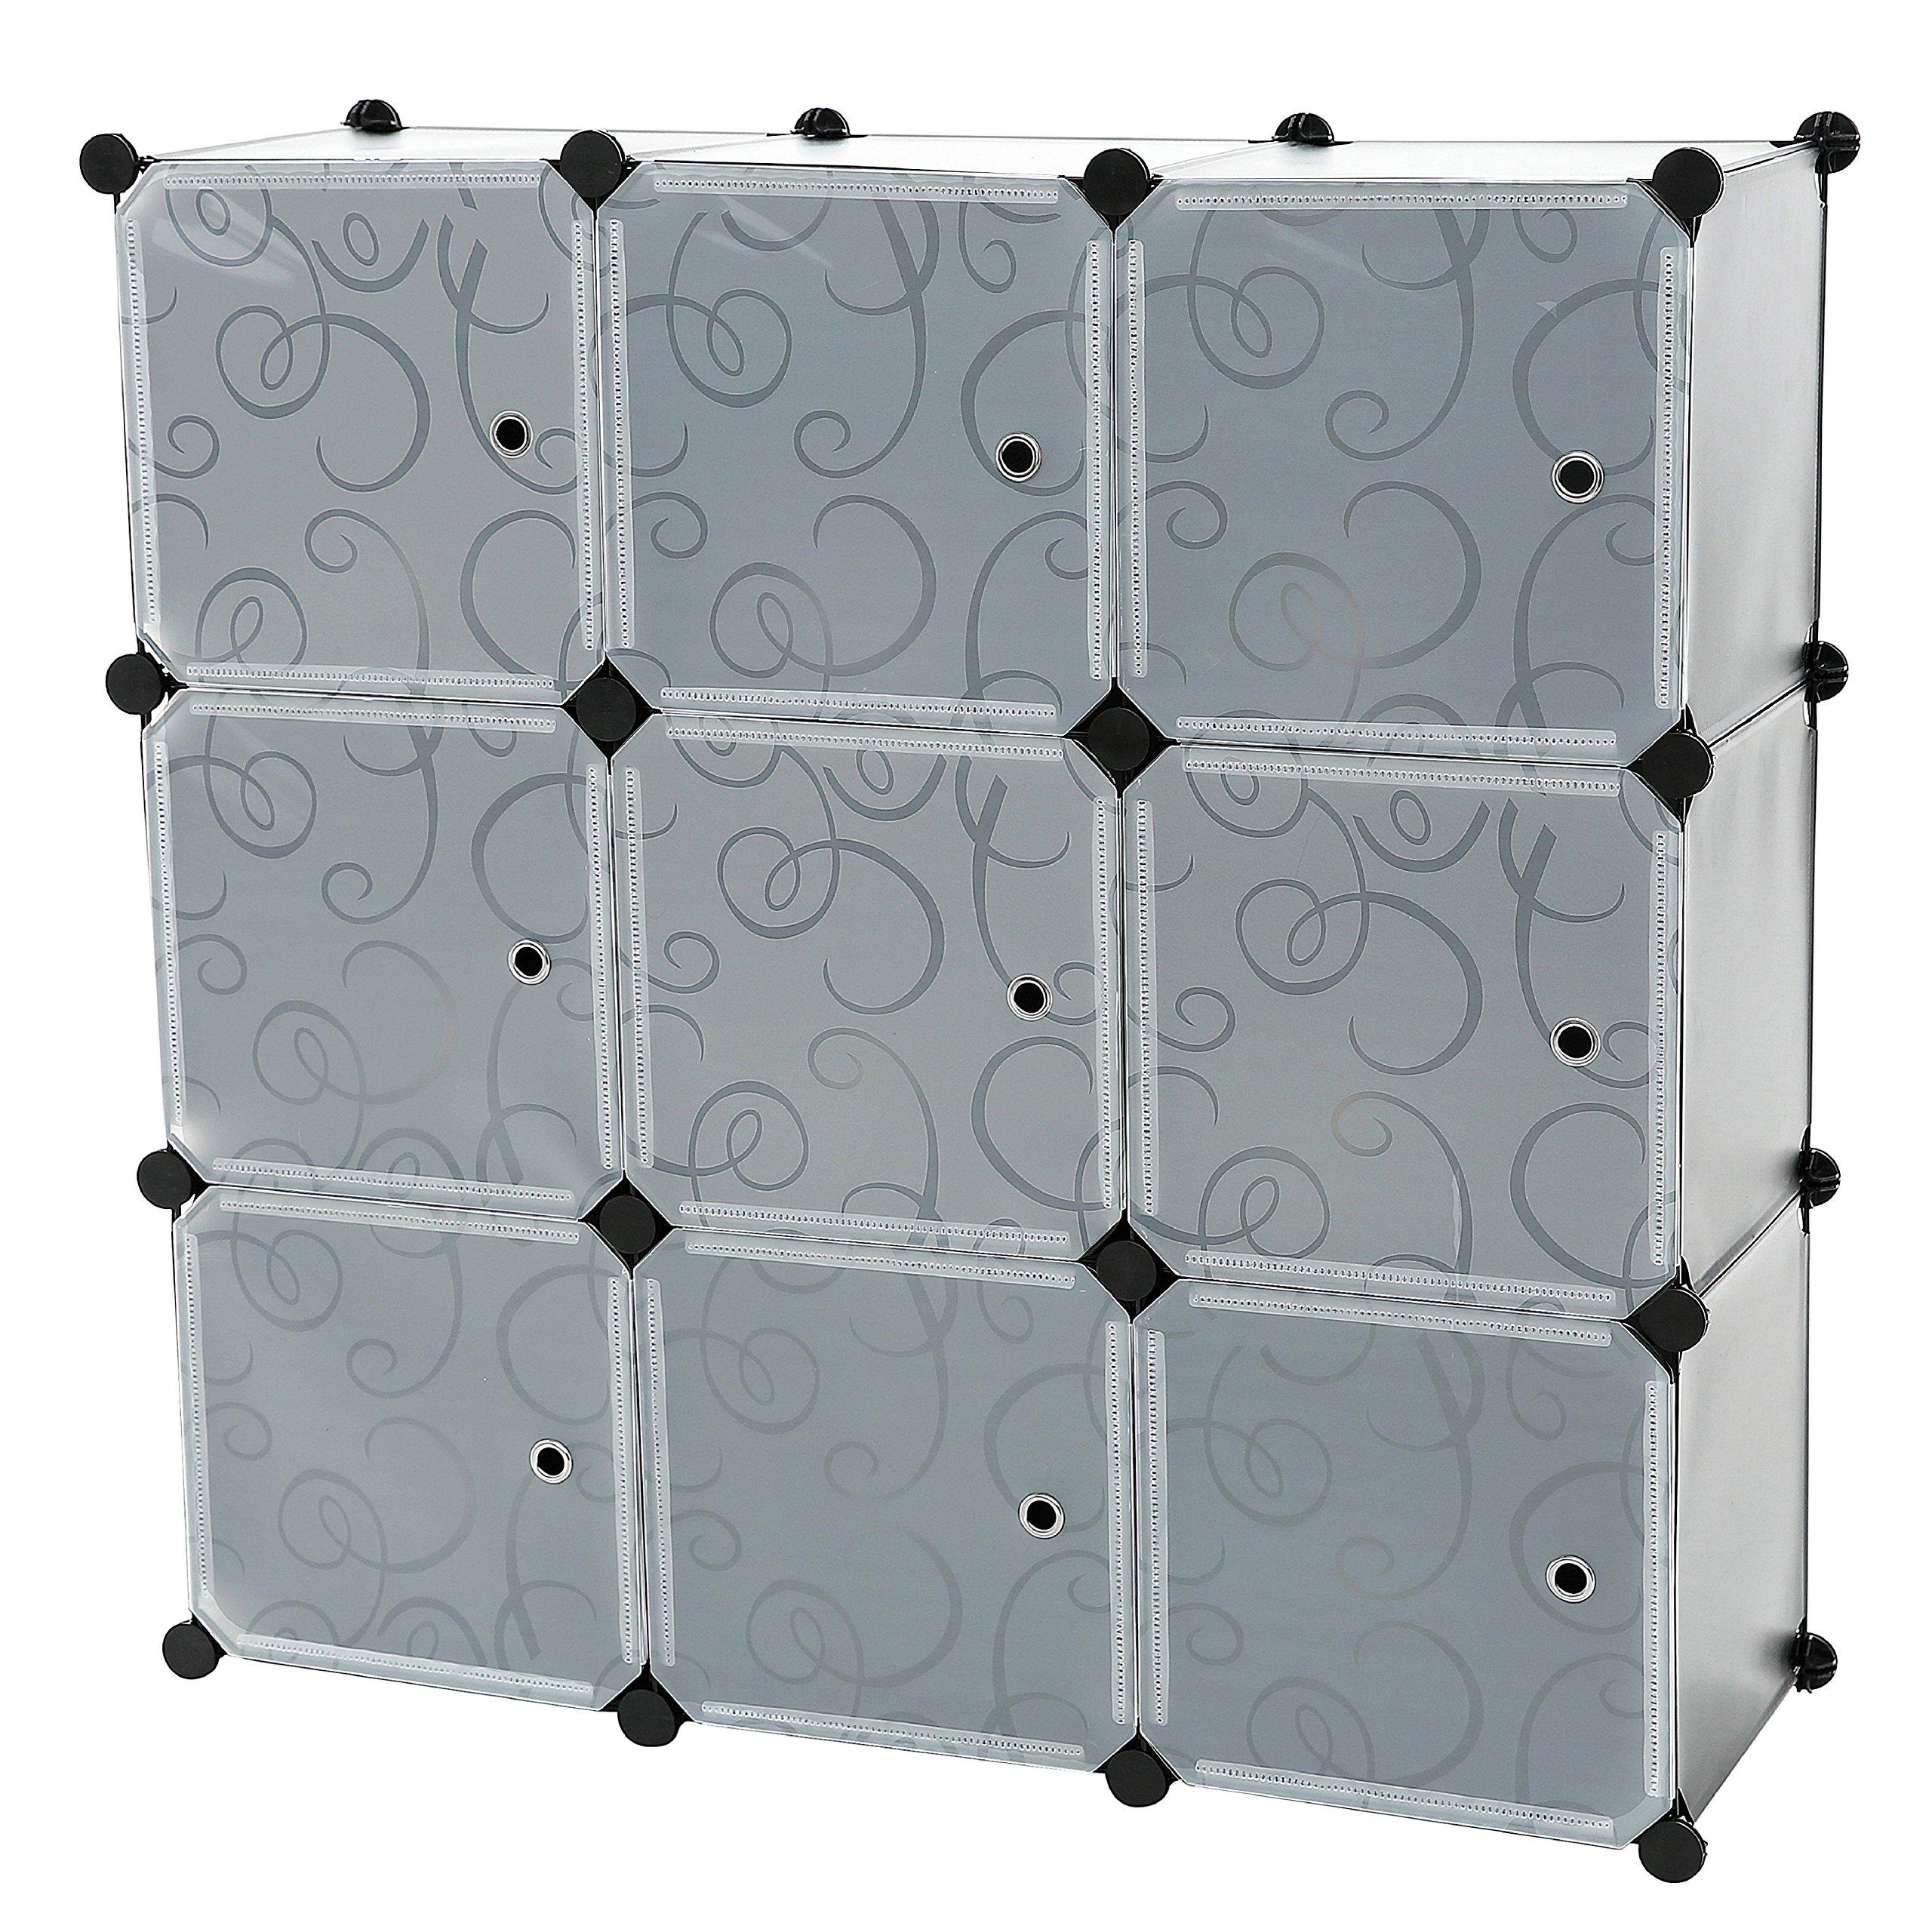 C&AHOME - 9 Cube Storage Organizer DIY Bookcase Shelf Toy Rack with Doors, Black